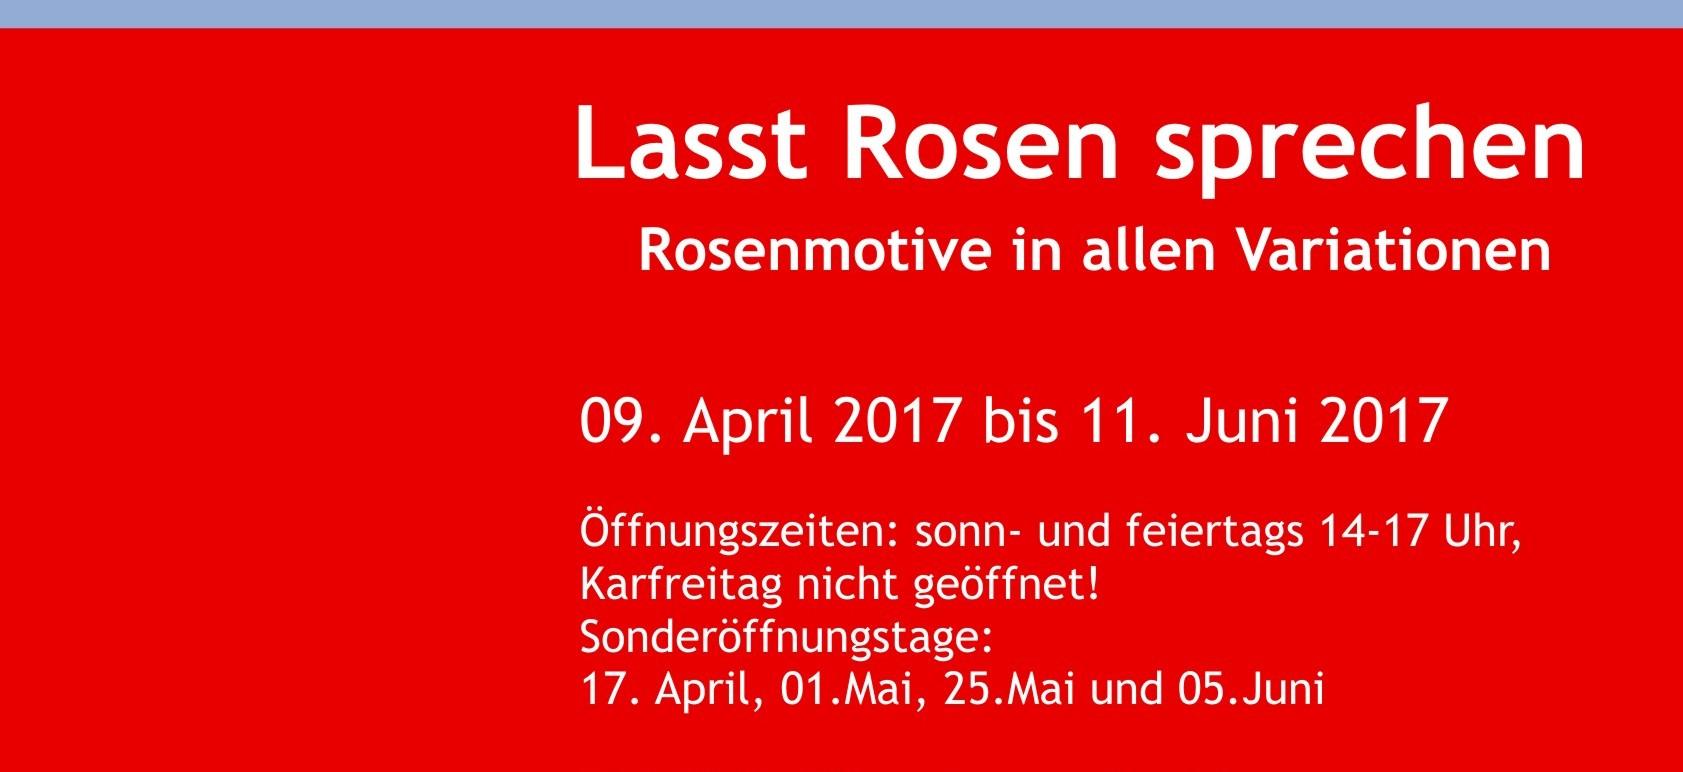 Lasst-Rosen-sprechen-2